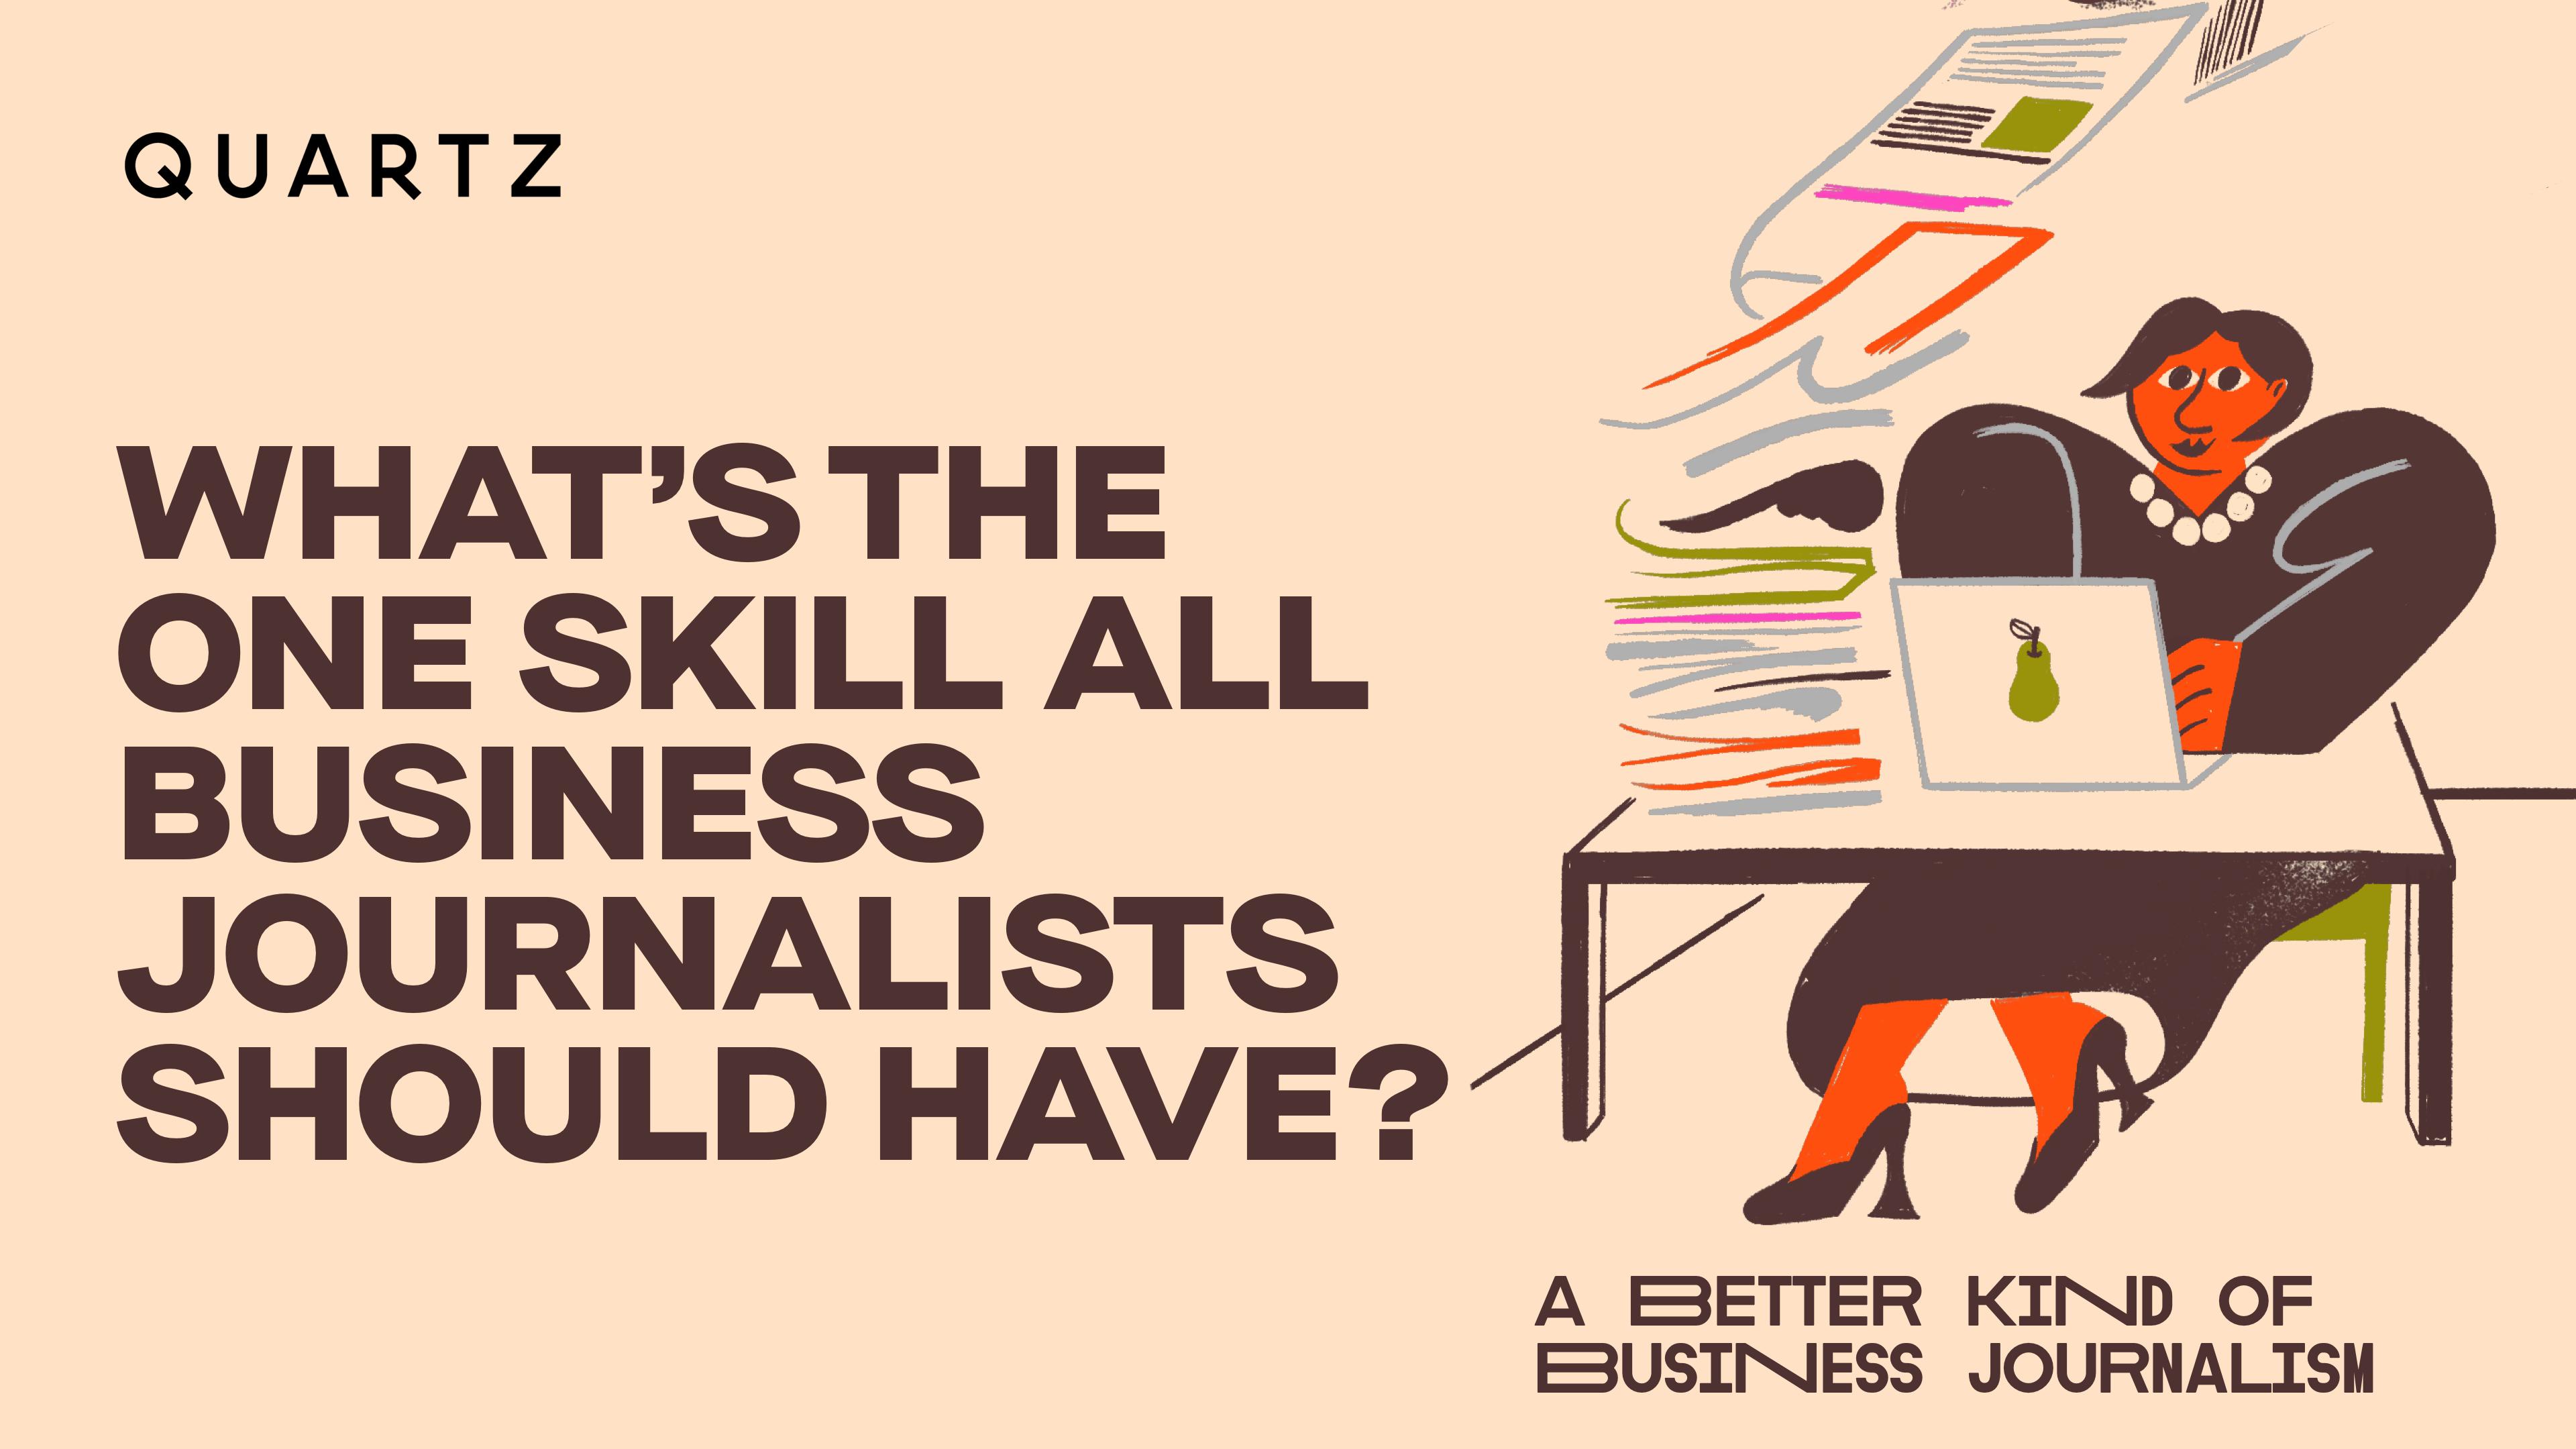 A poster for Quartz's business journalism webinar series.